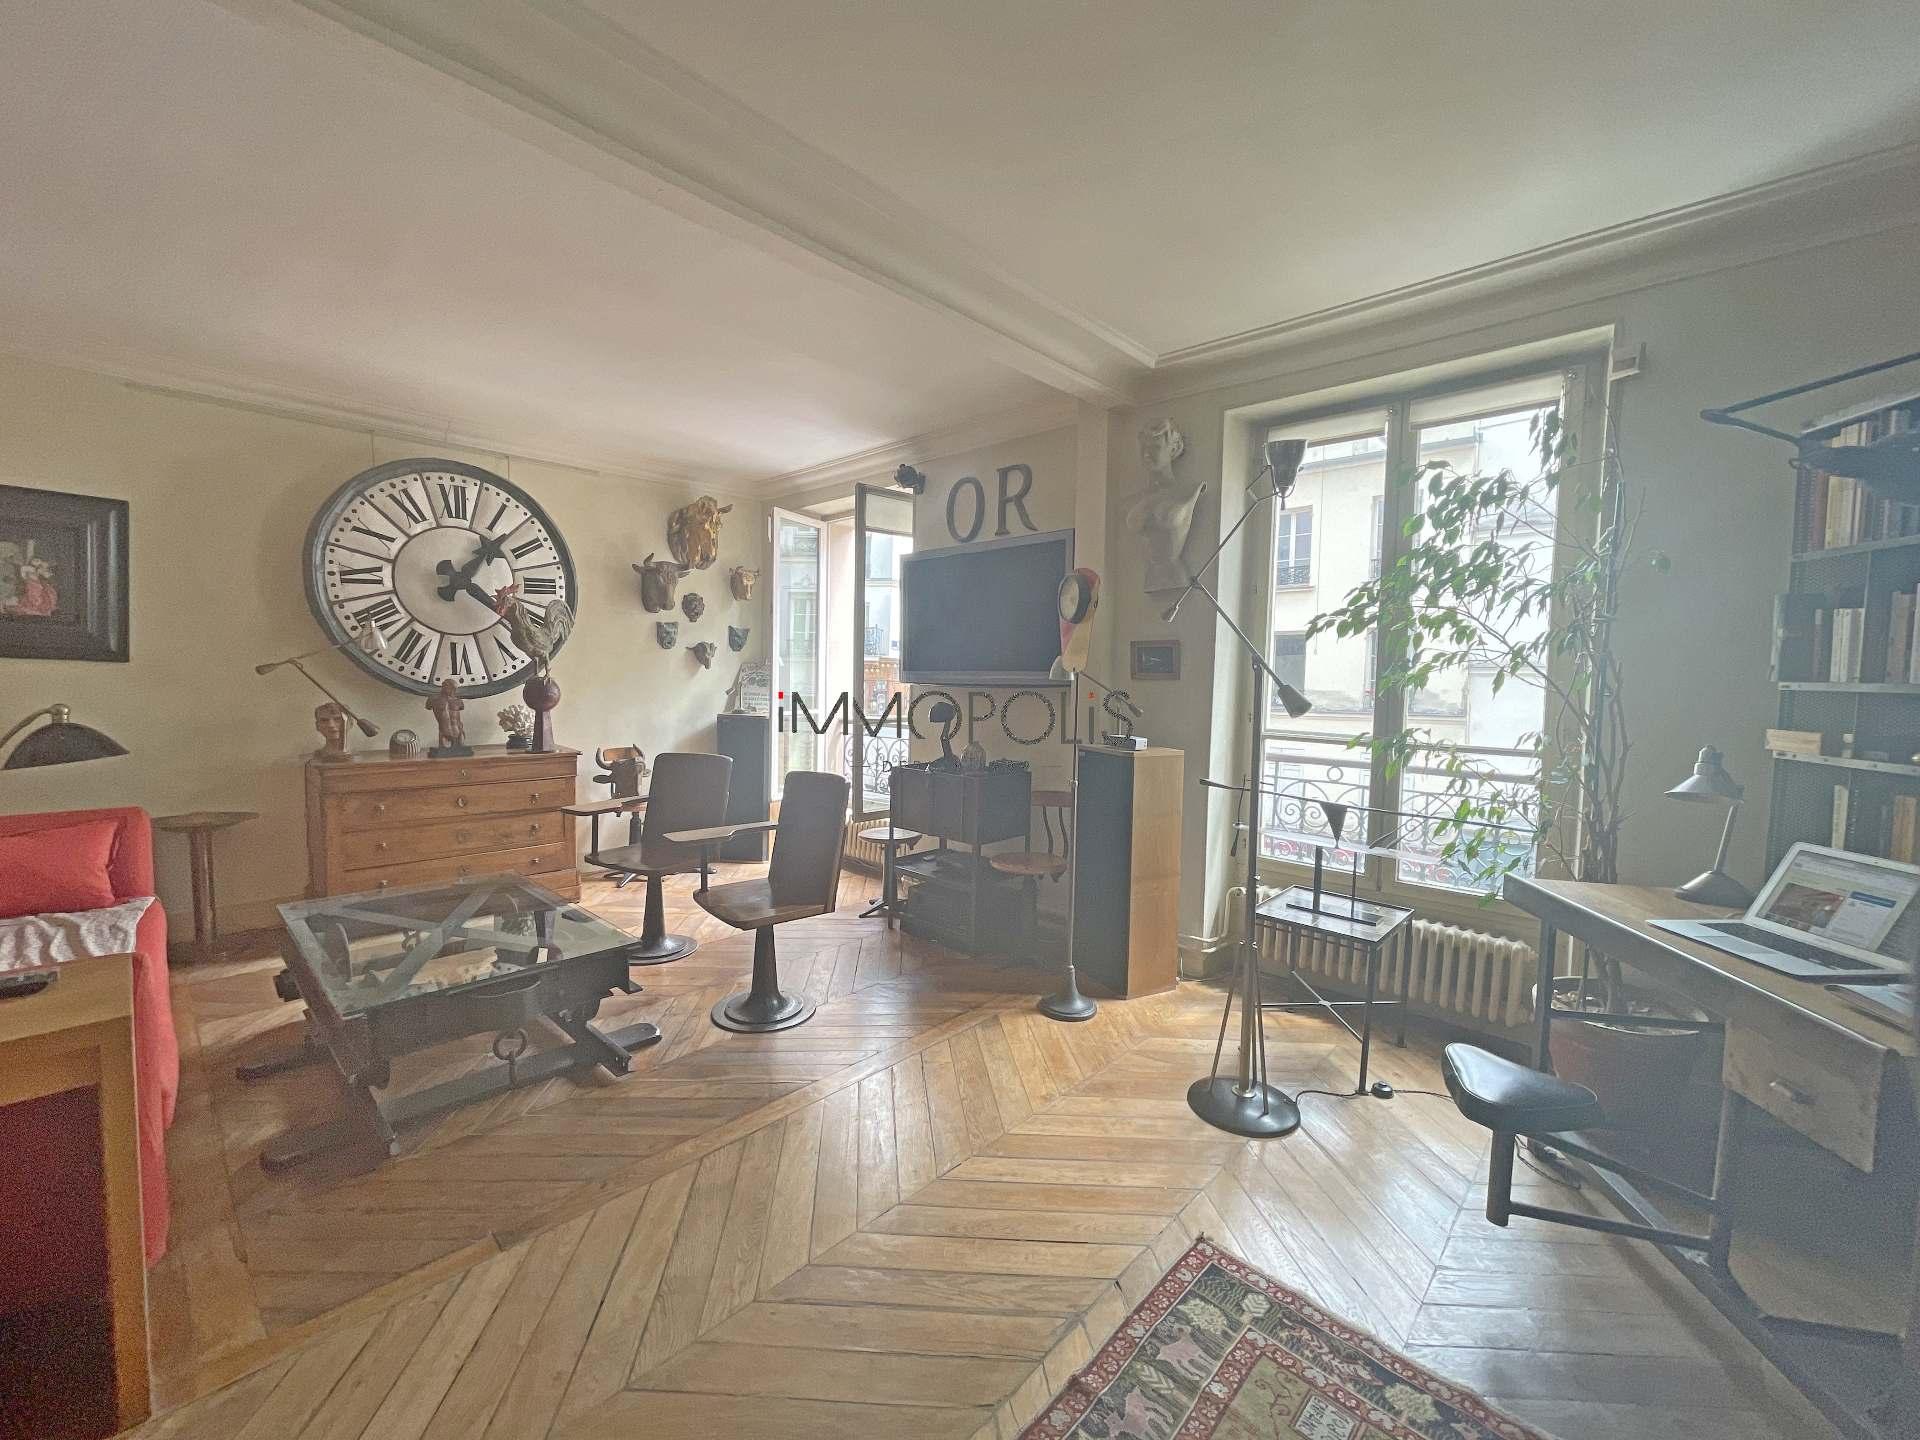 3 rooms Rue Ravignan duplex + room of service! 1